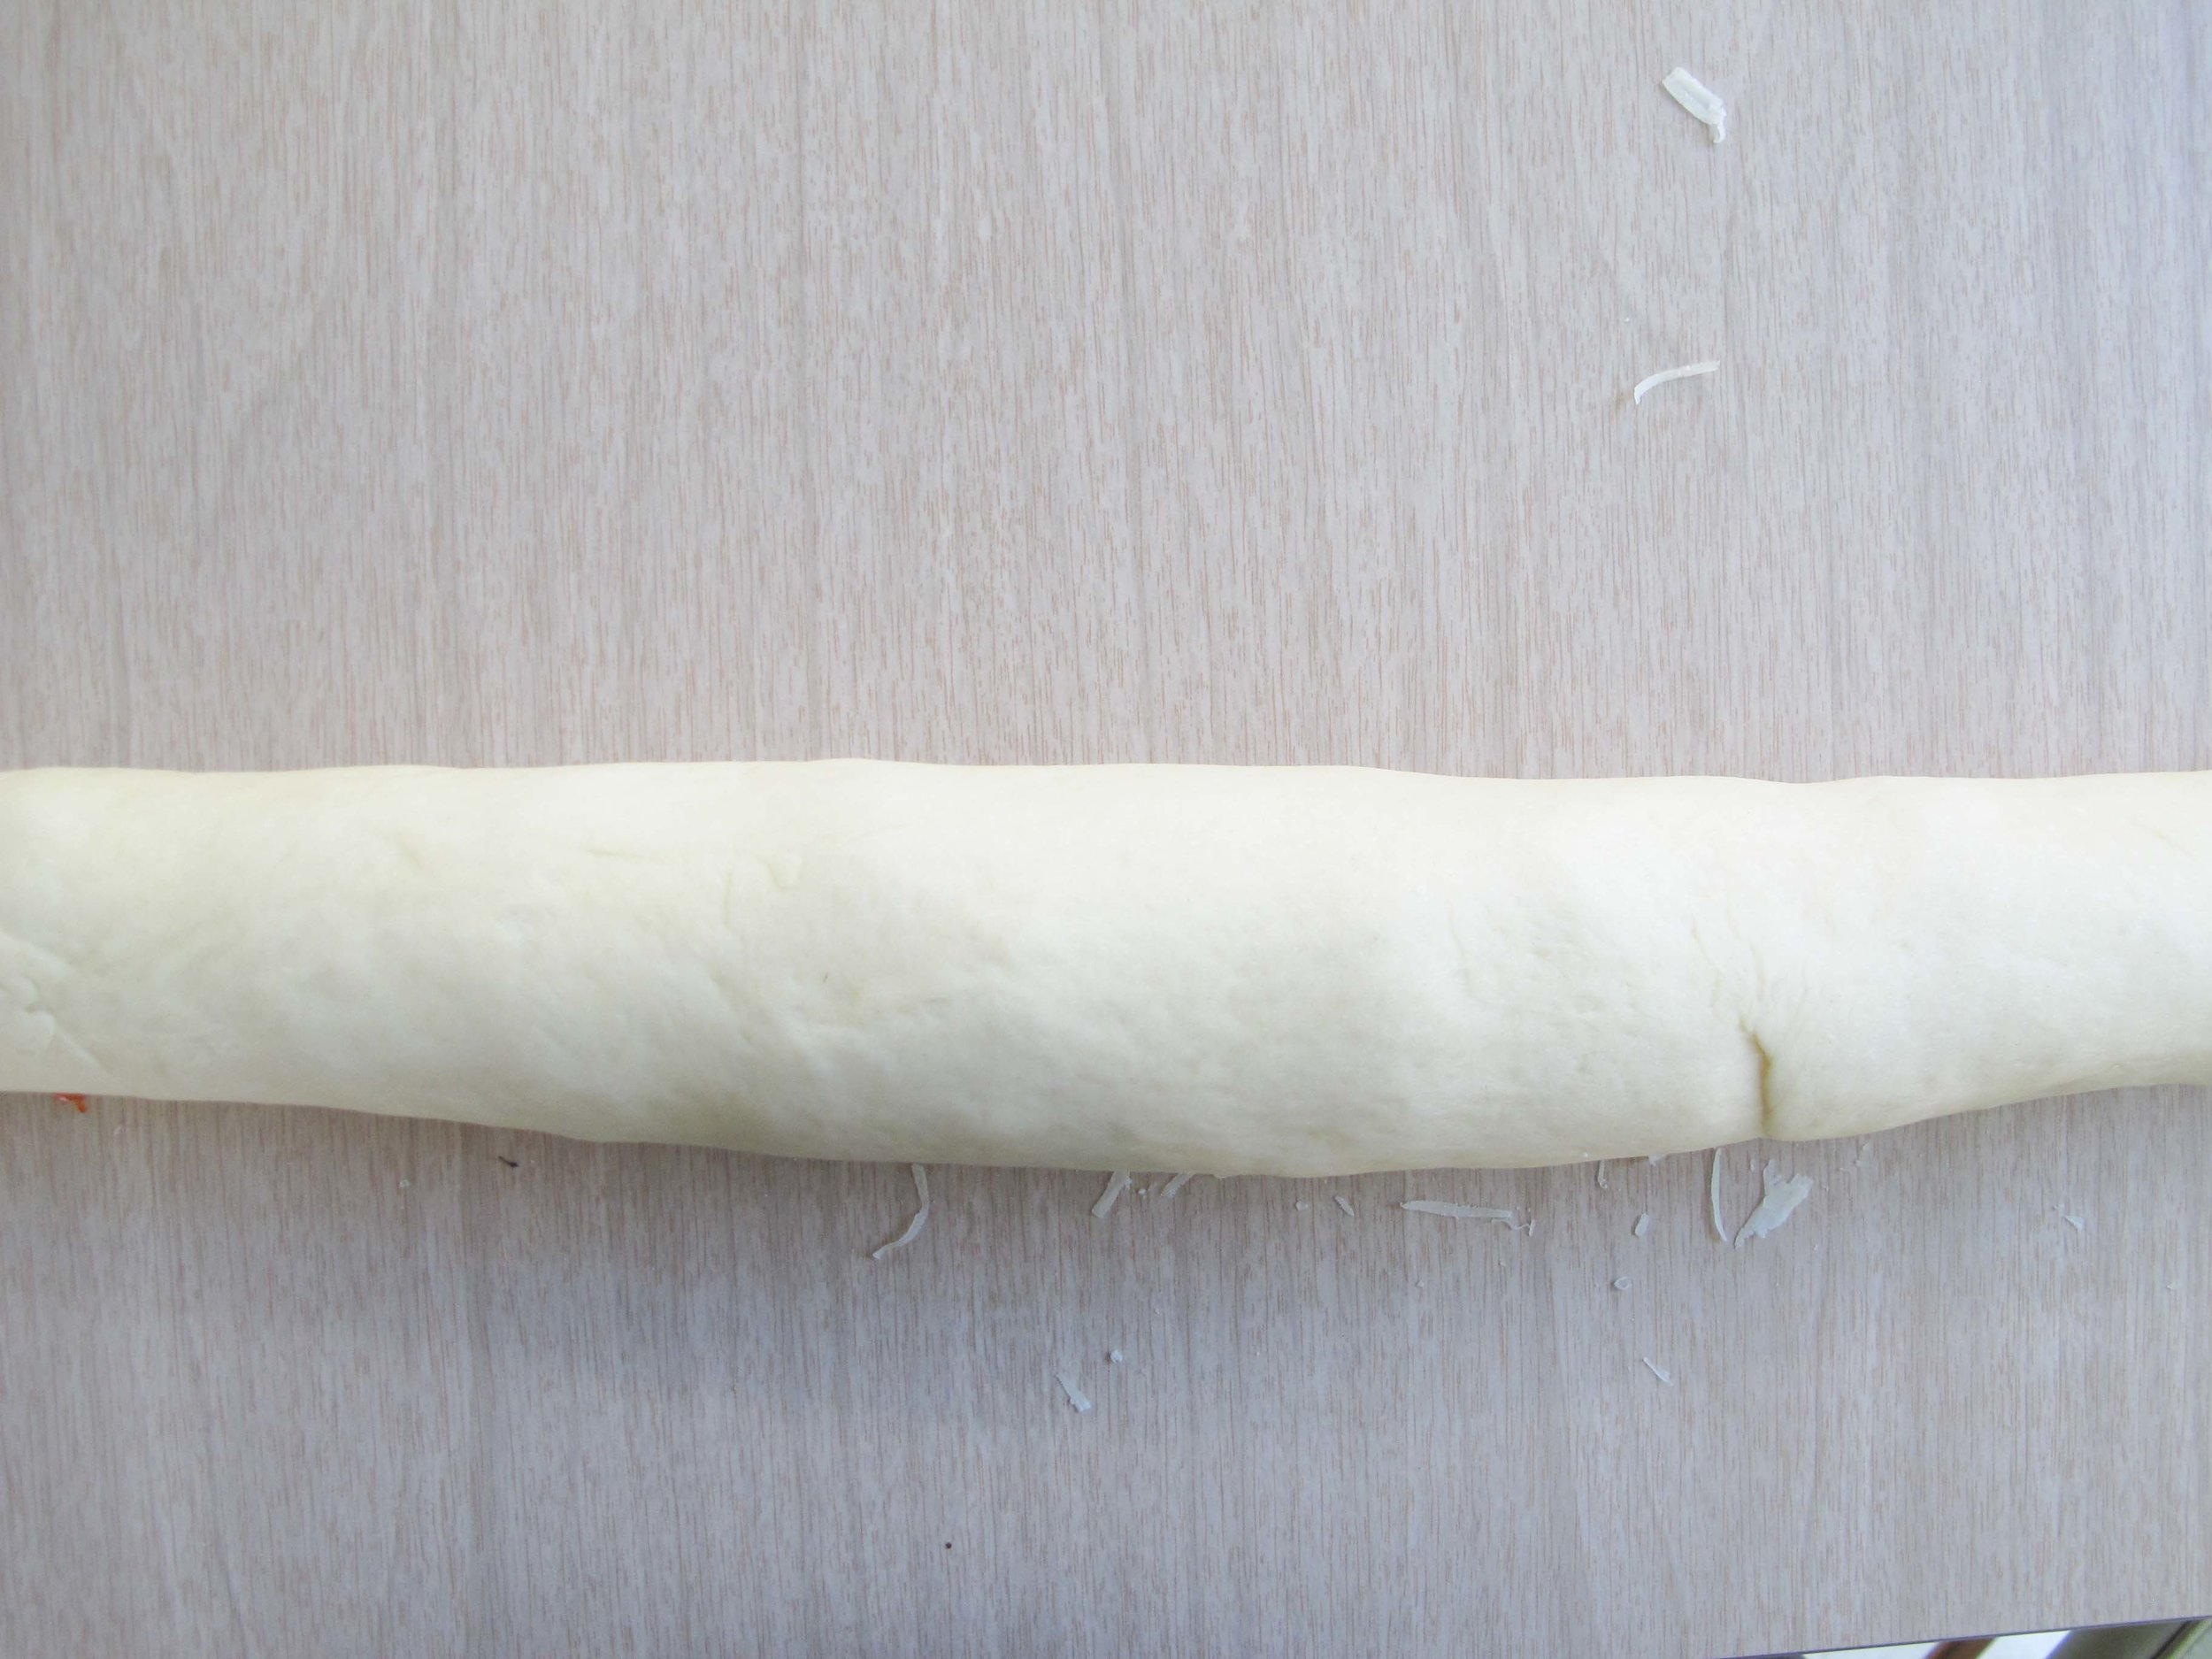 pane bianco.jpg